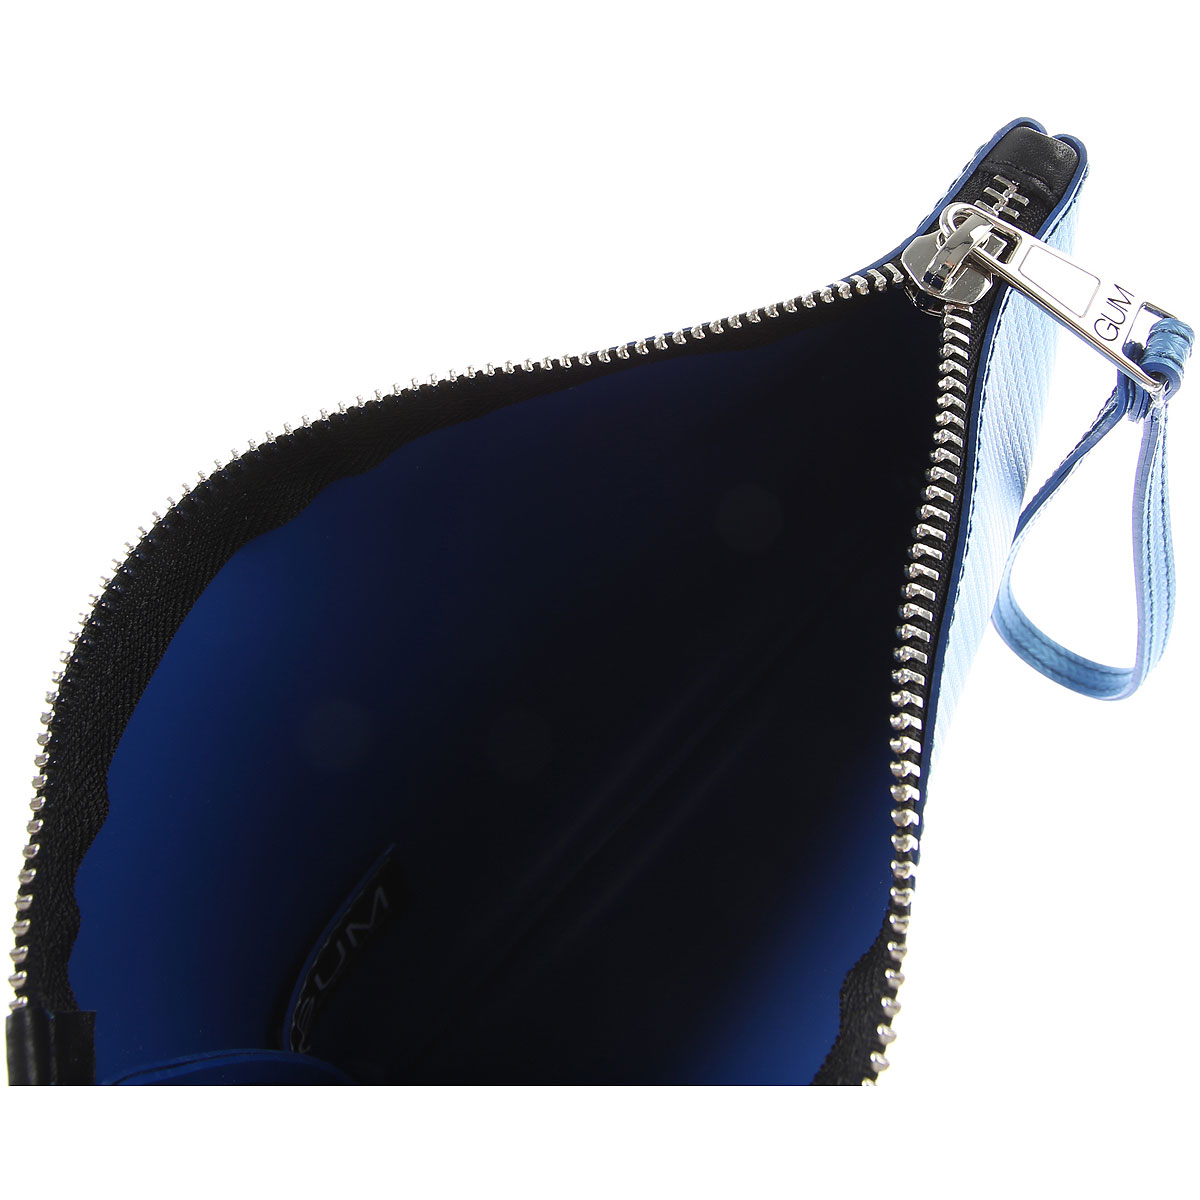 391a744ad 2019 Primavera Bolsos verano Gum Gianni nbsp;púrpura Carteras Design  Chiarini Azul Negro aww0xqO